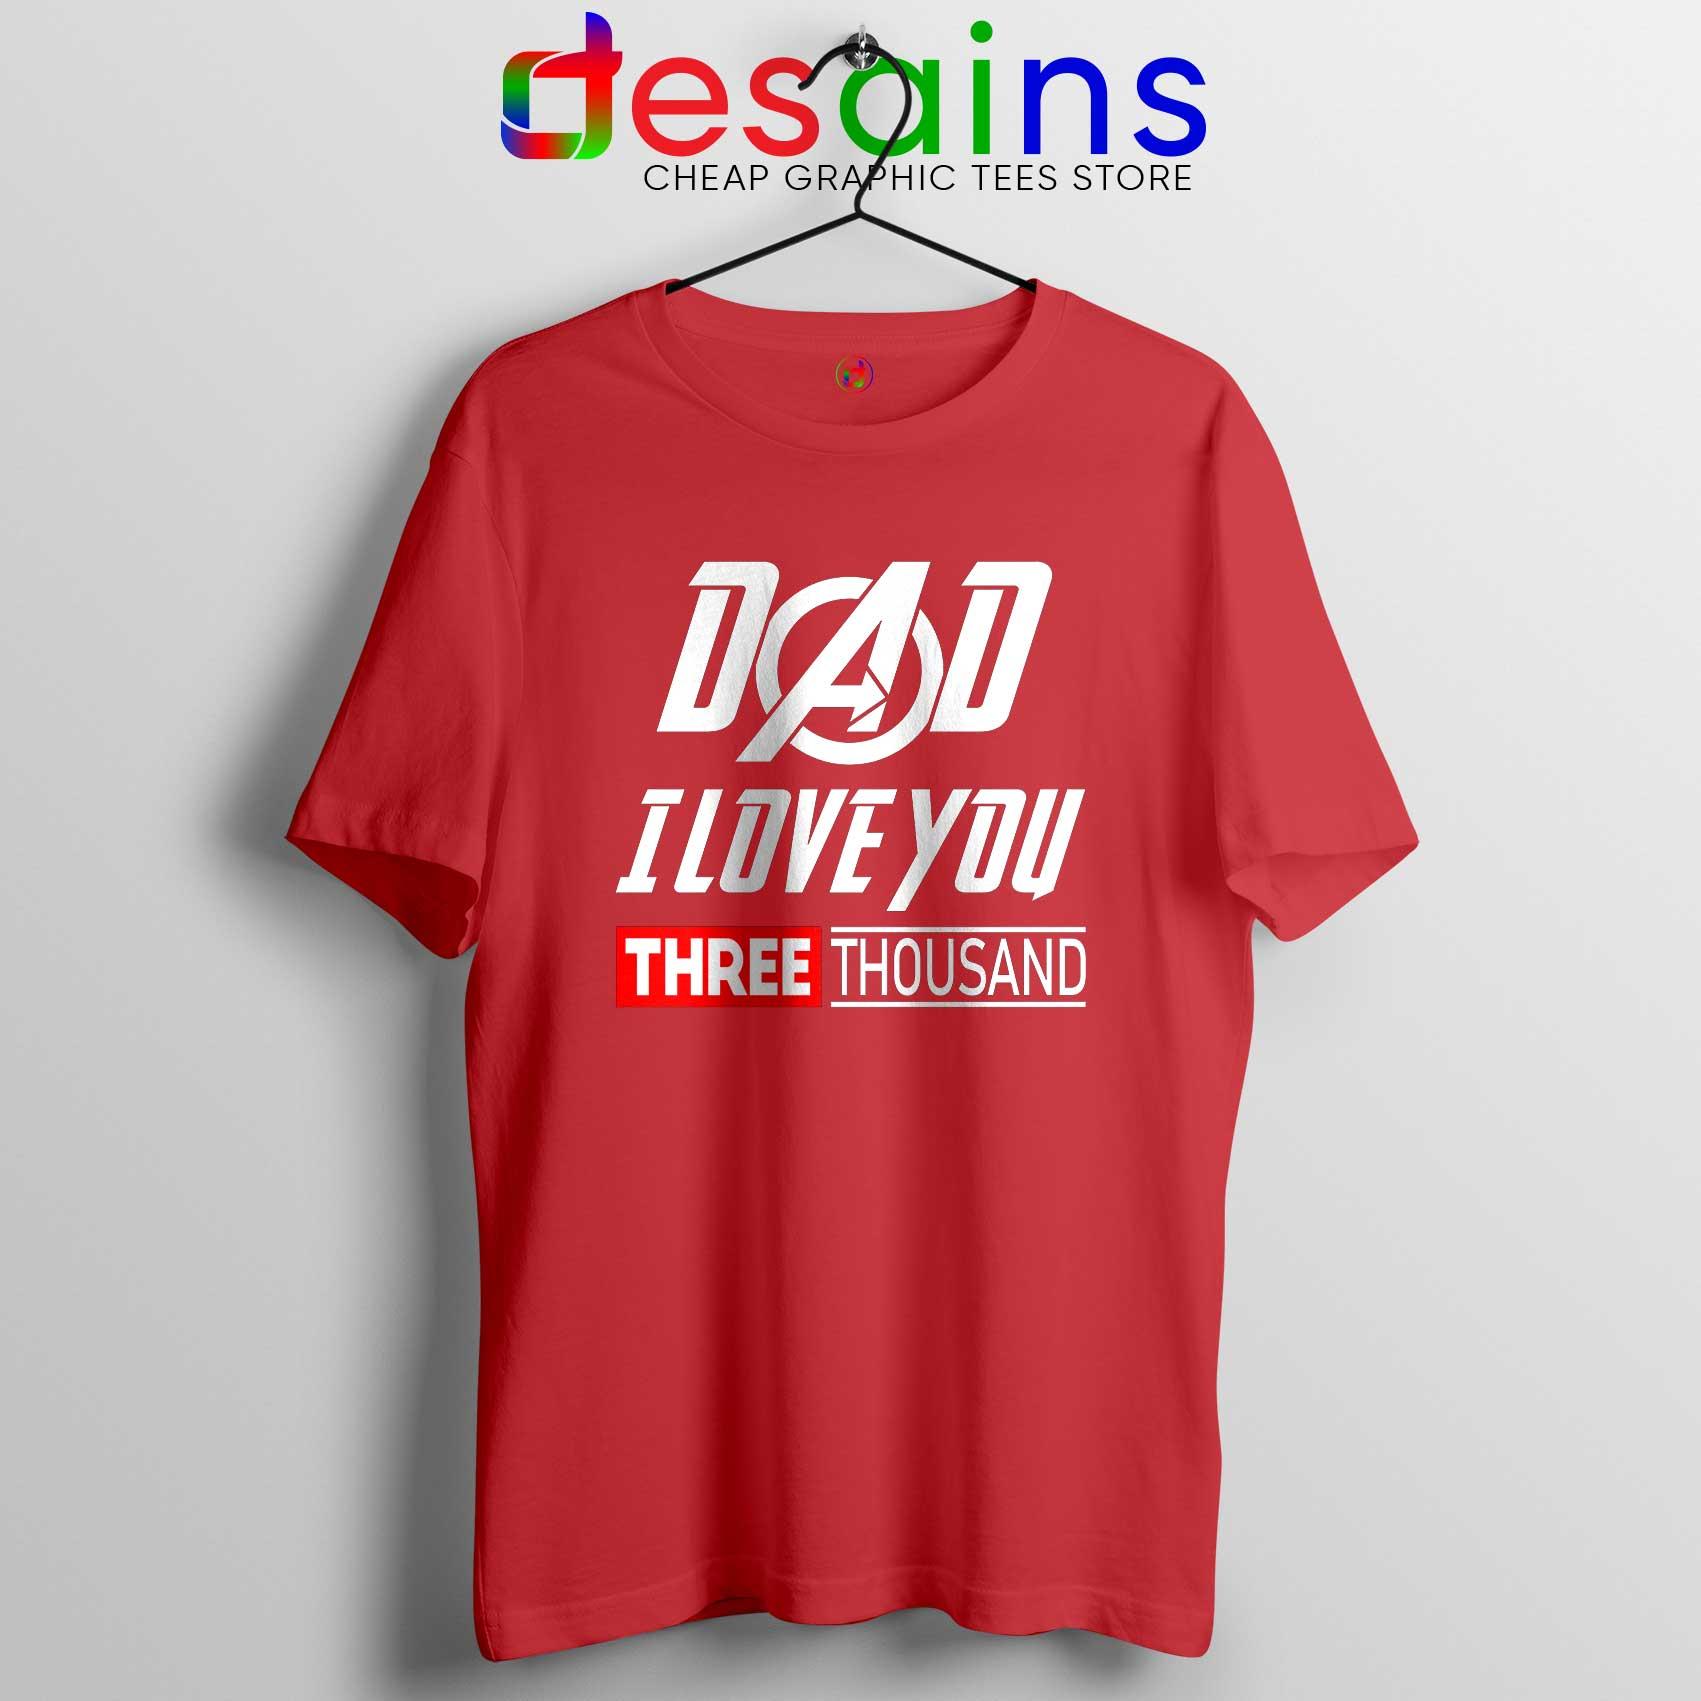 e9b2c0d7 Dad I Love You 3000 Tee Shirt Iron Man Avengers Endgame Size S-3XL